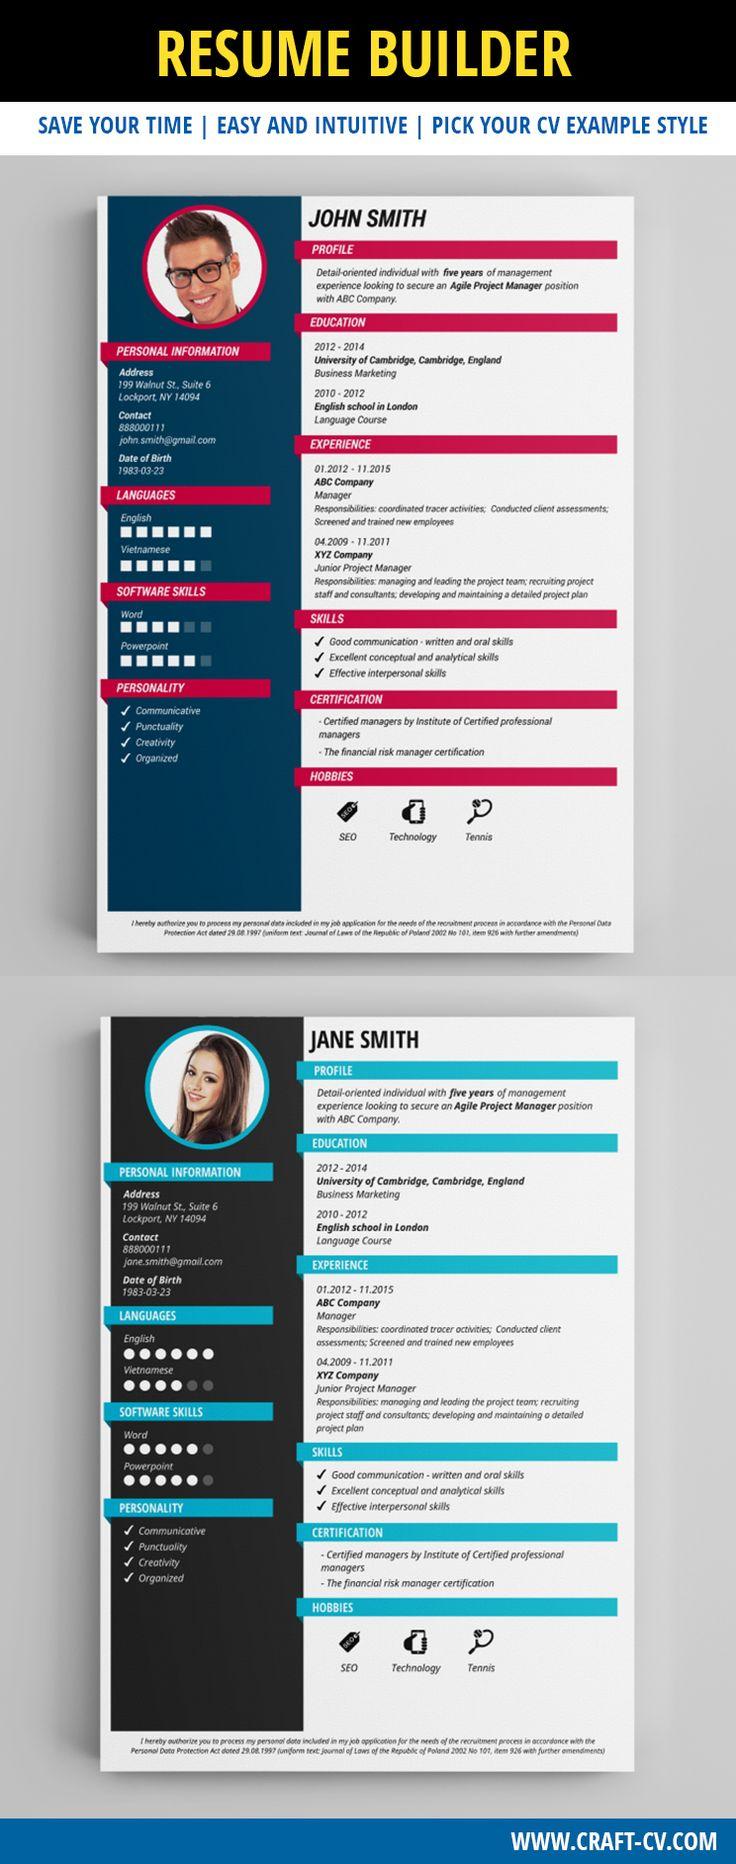 Resume Builder   Creative Resume Templates #creativeresume #resume #cv